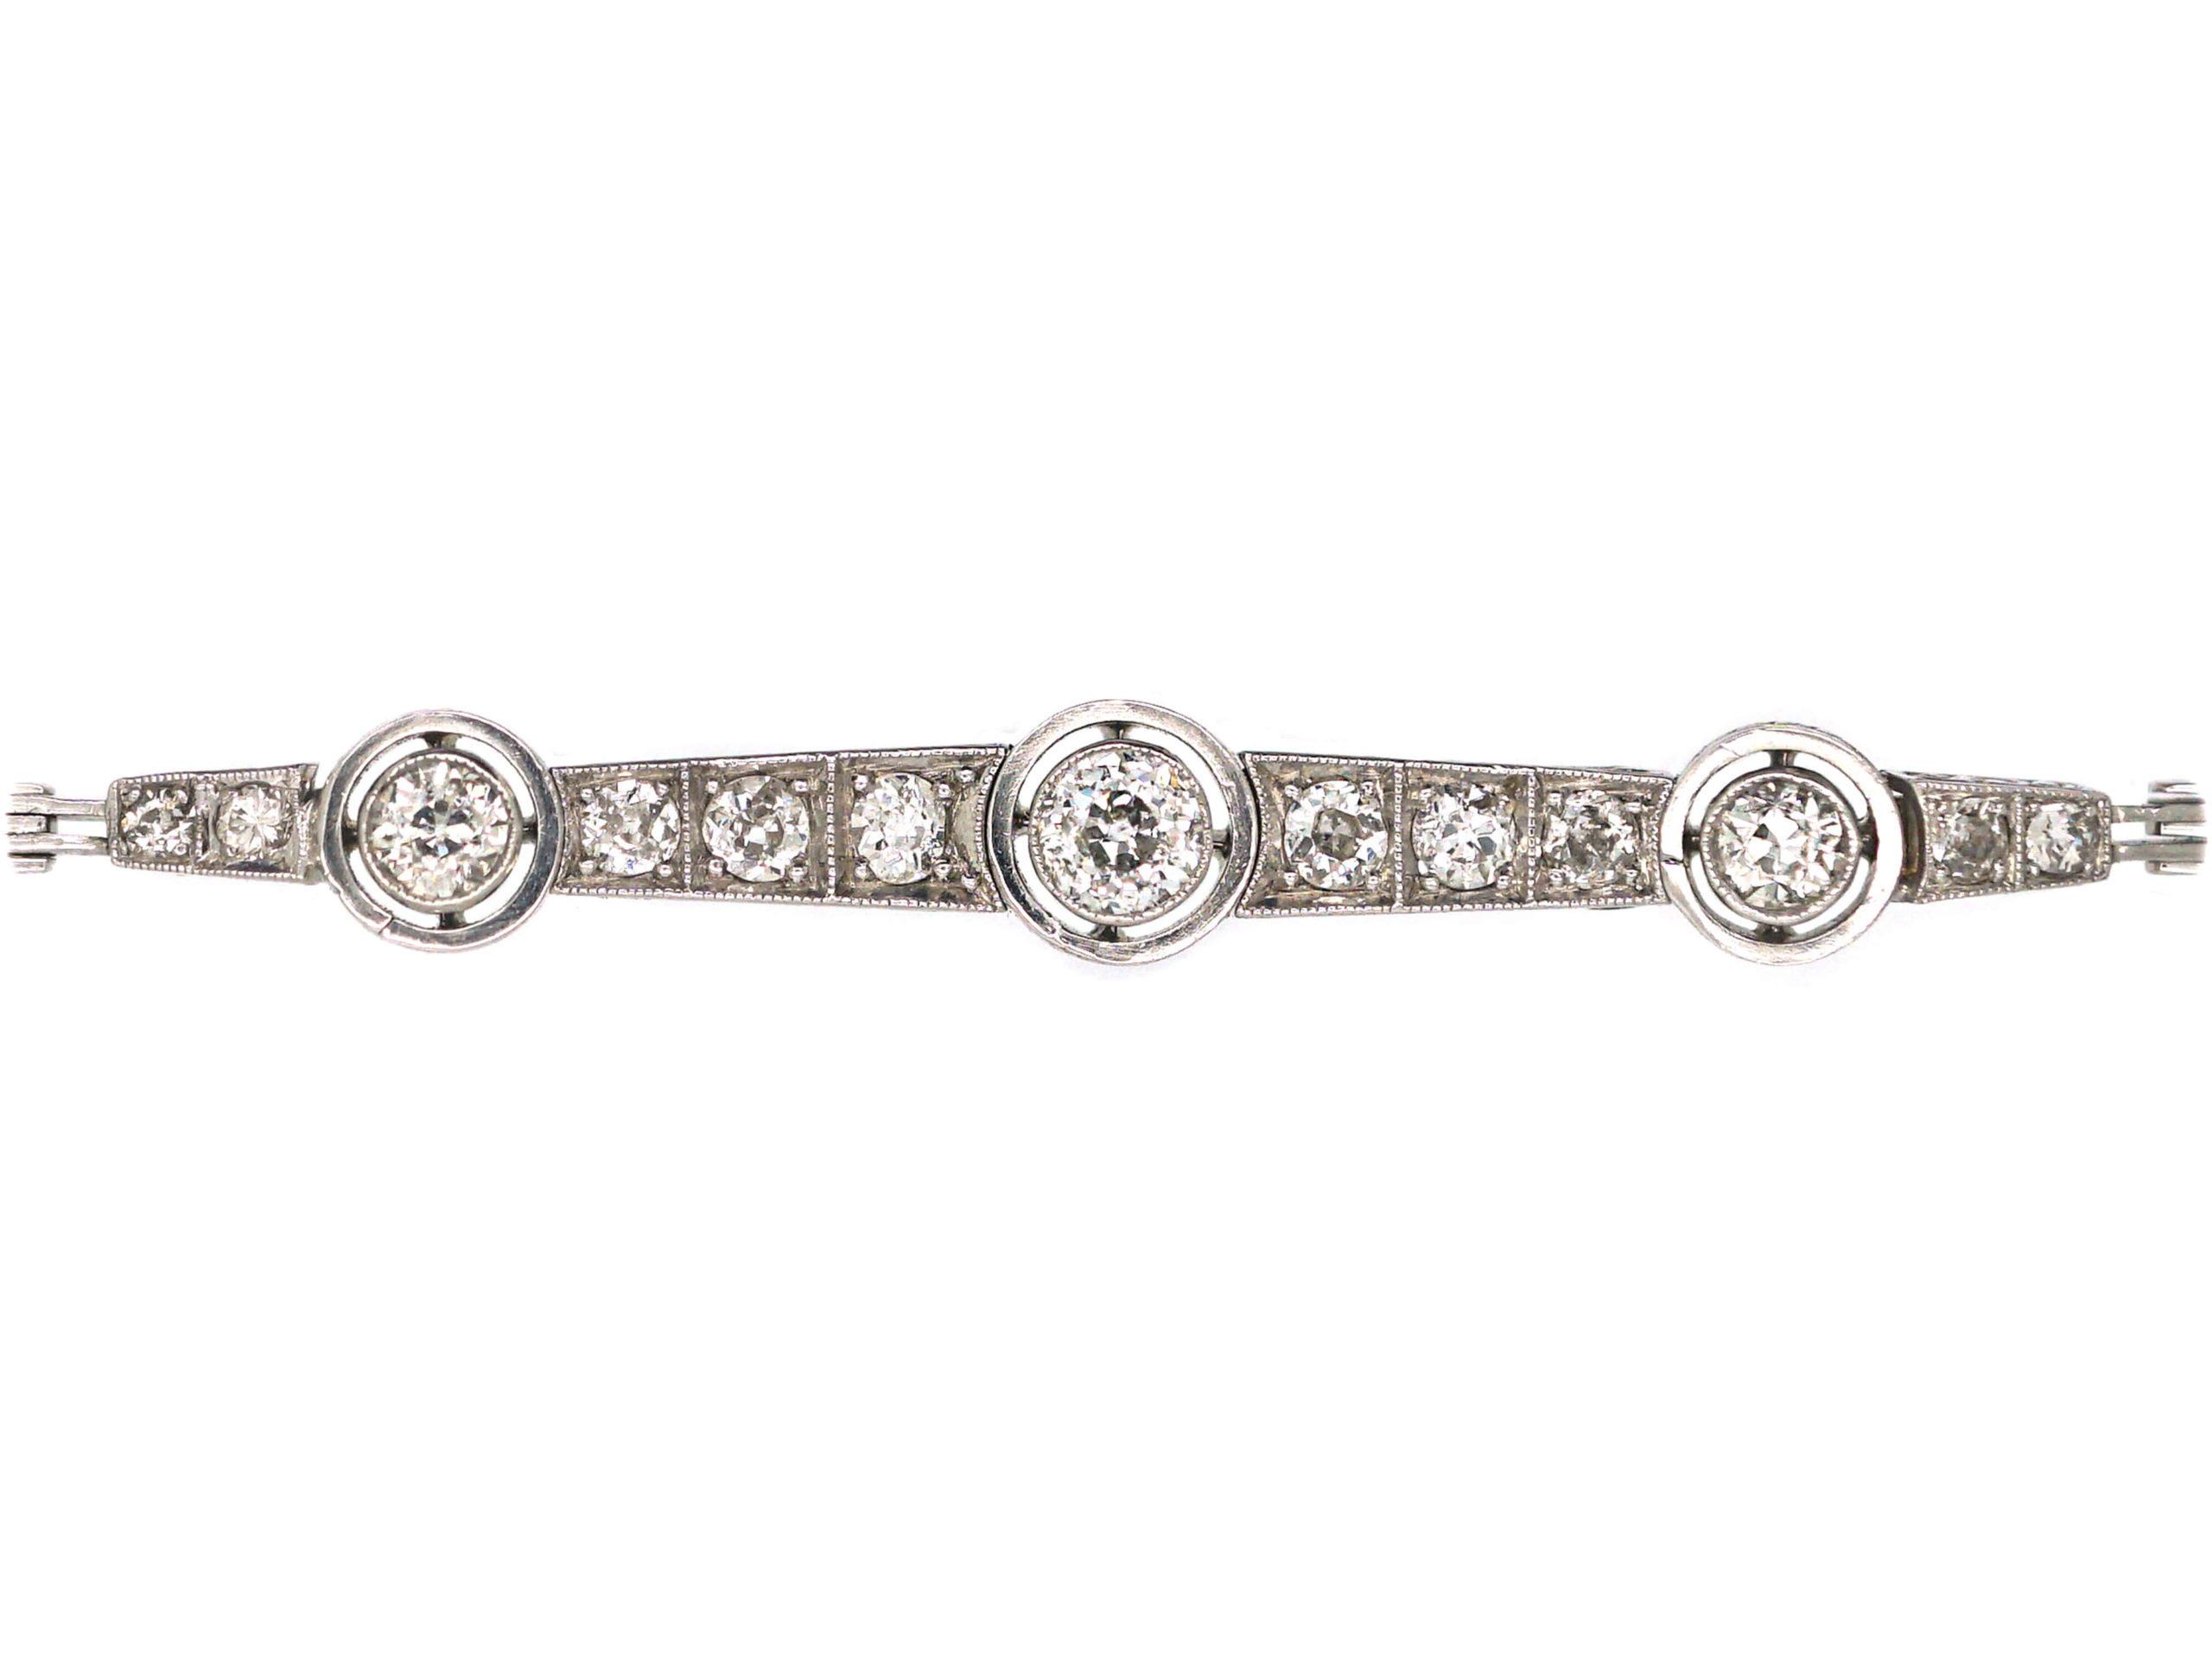 Art Deco 18ct White Gold Three Stone Diamond Bracelet